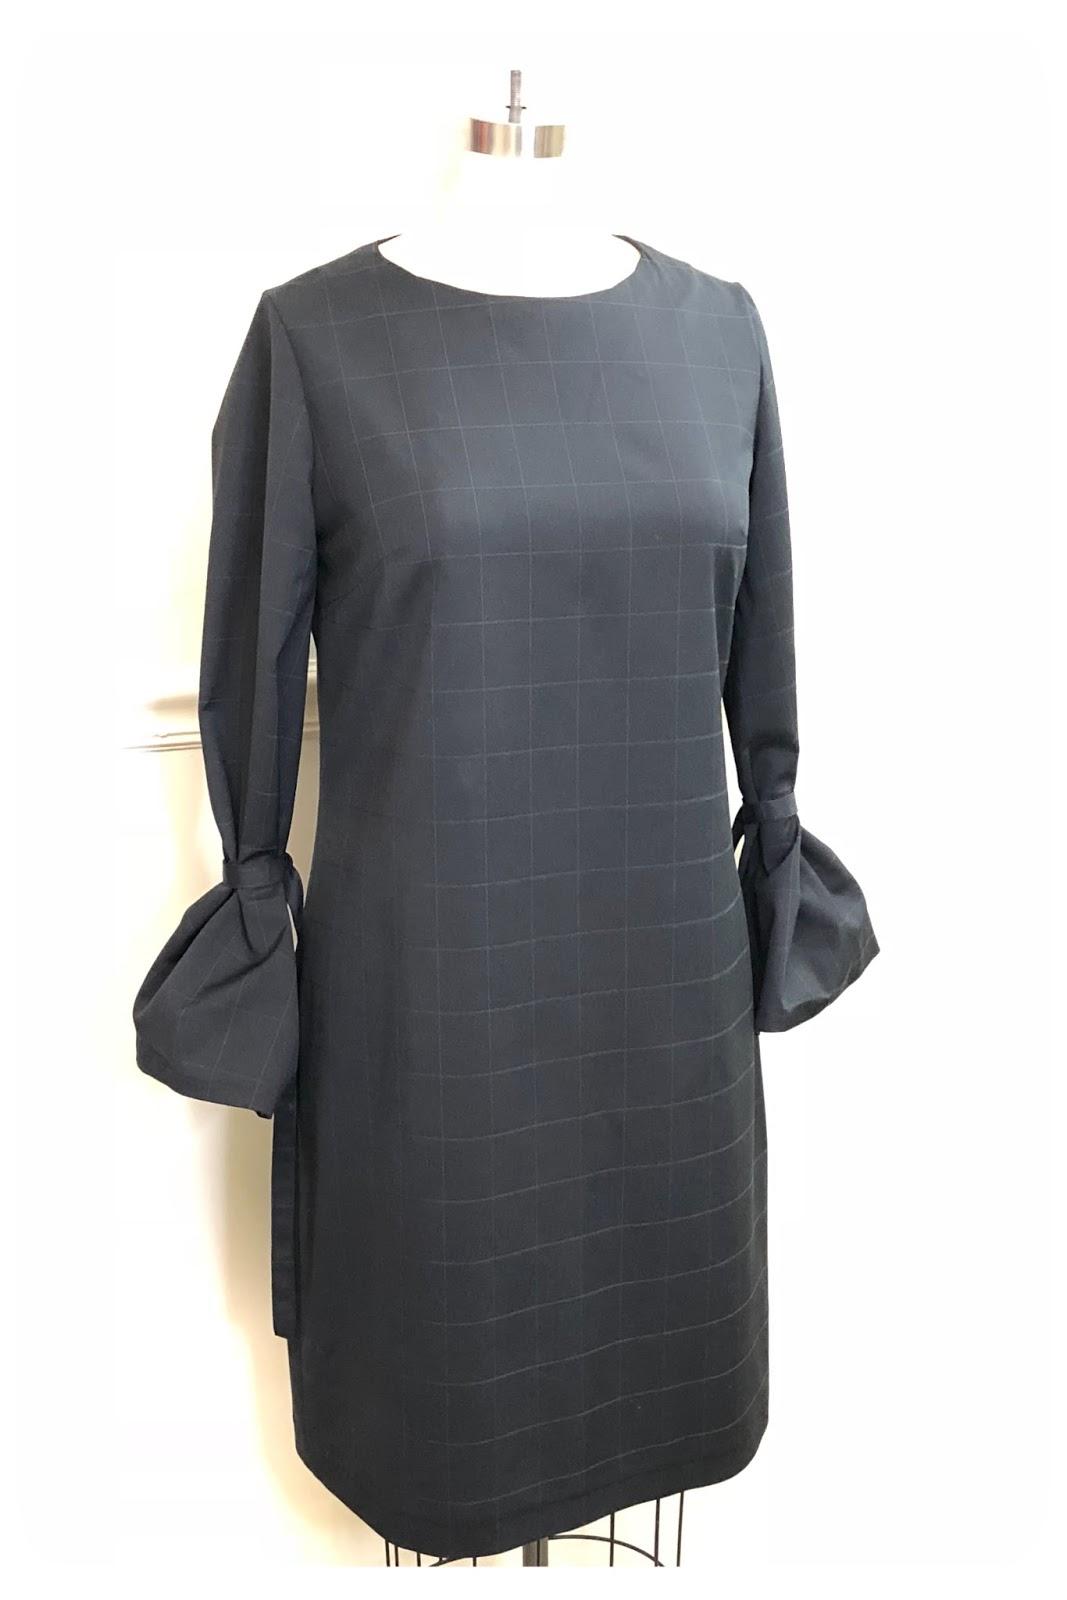 New Look 6524 | Little Black Shift Dress - Erica Bunker DIY Style!